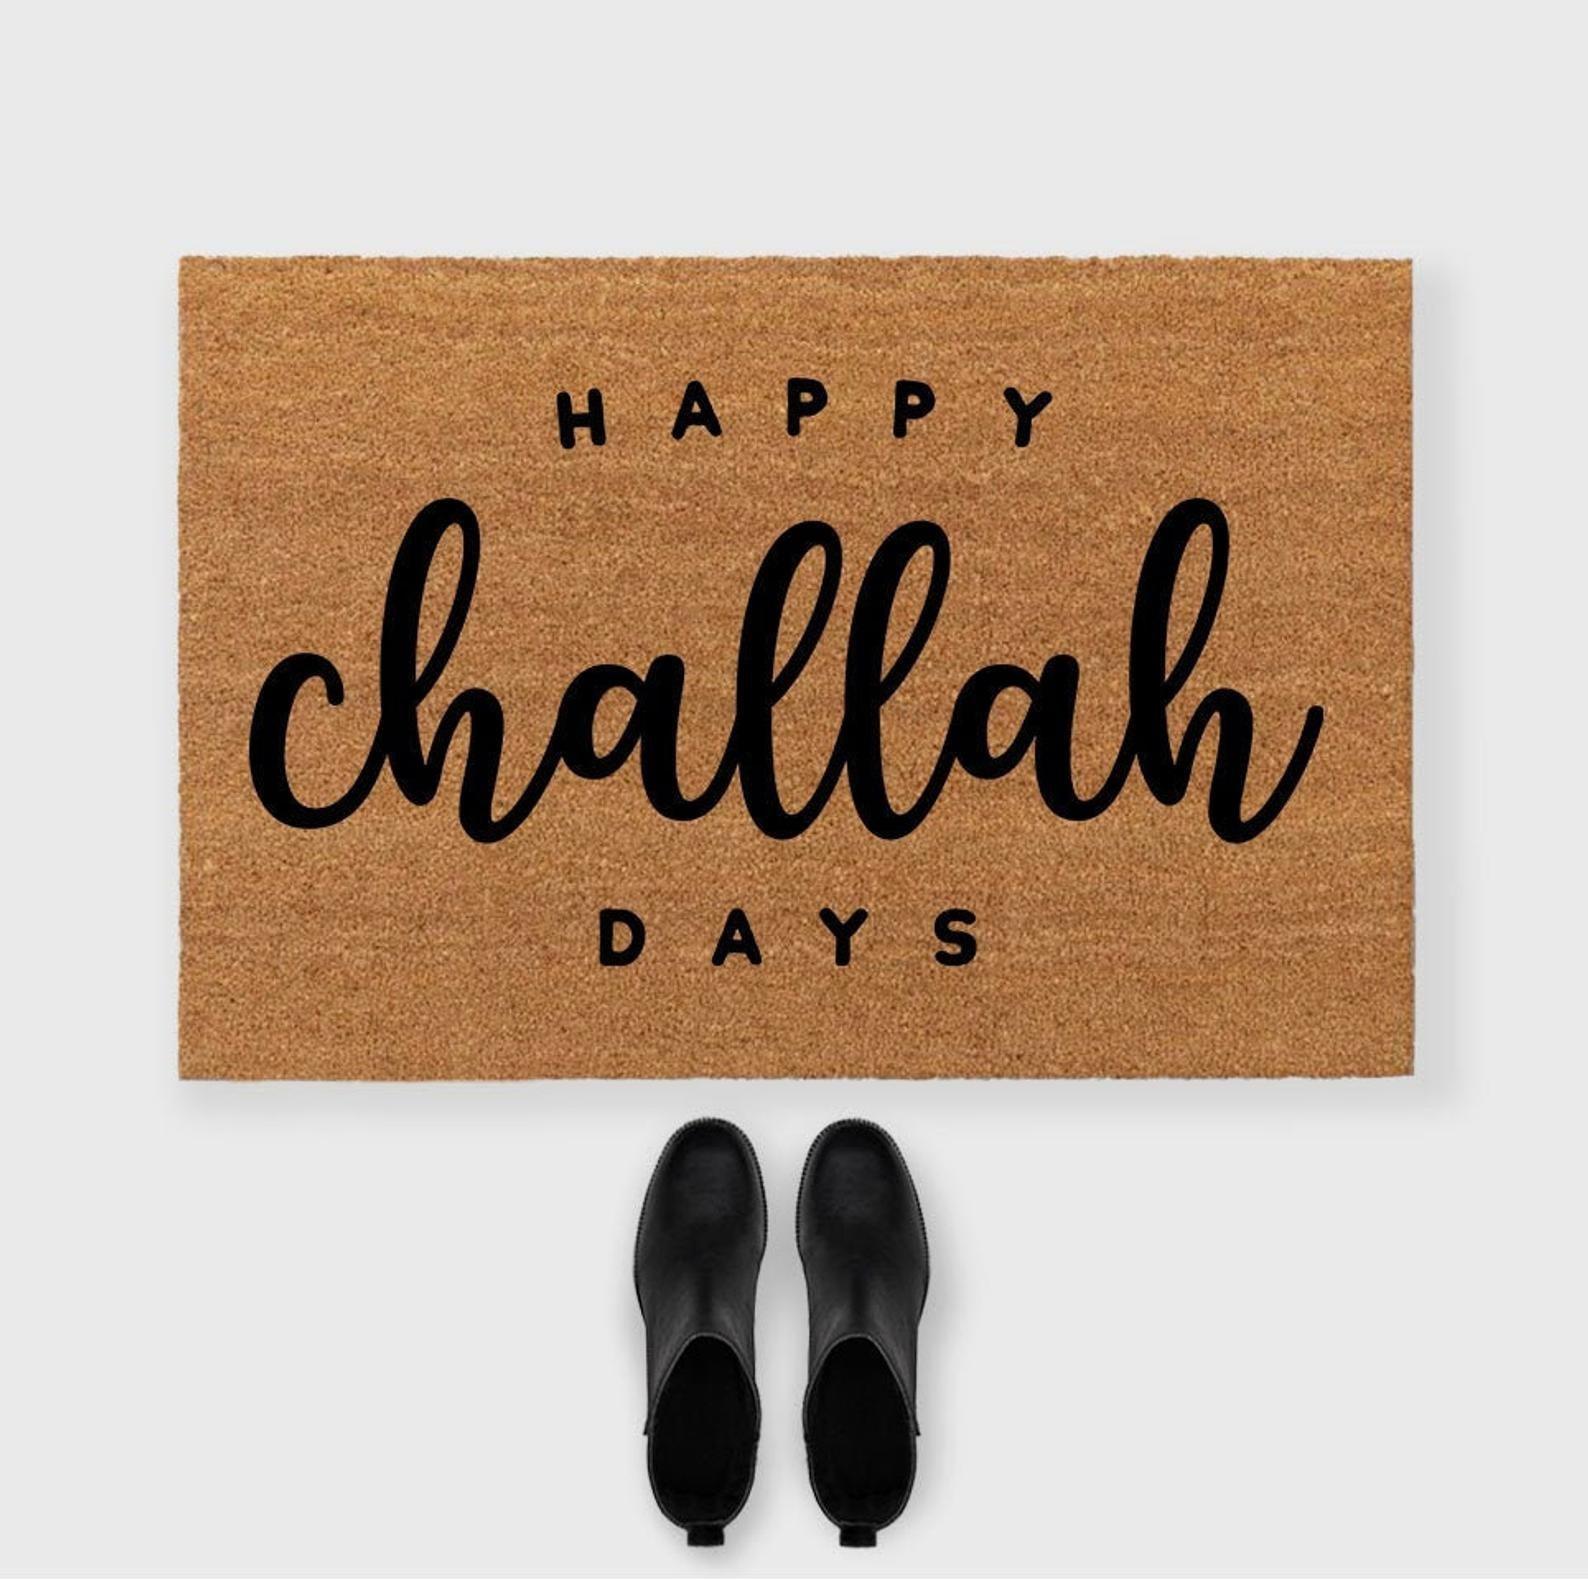 Happy Challah days doormat